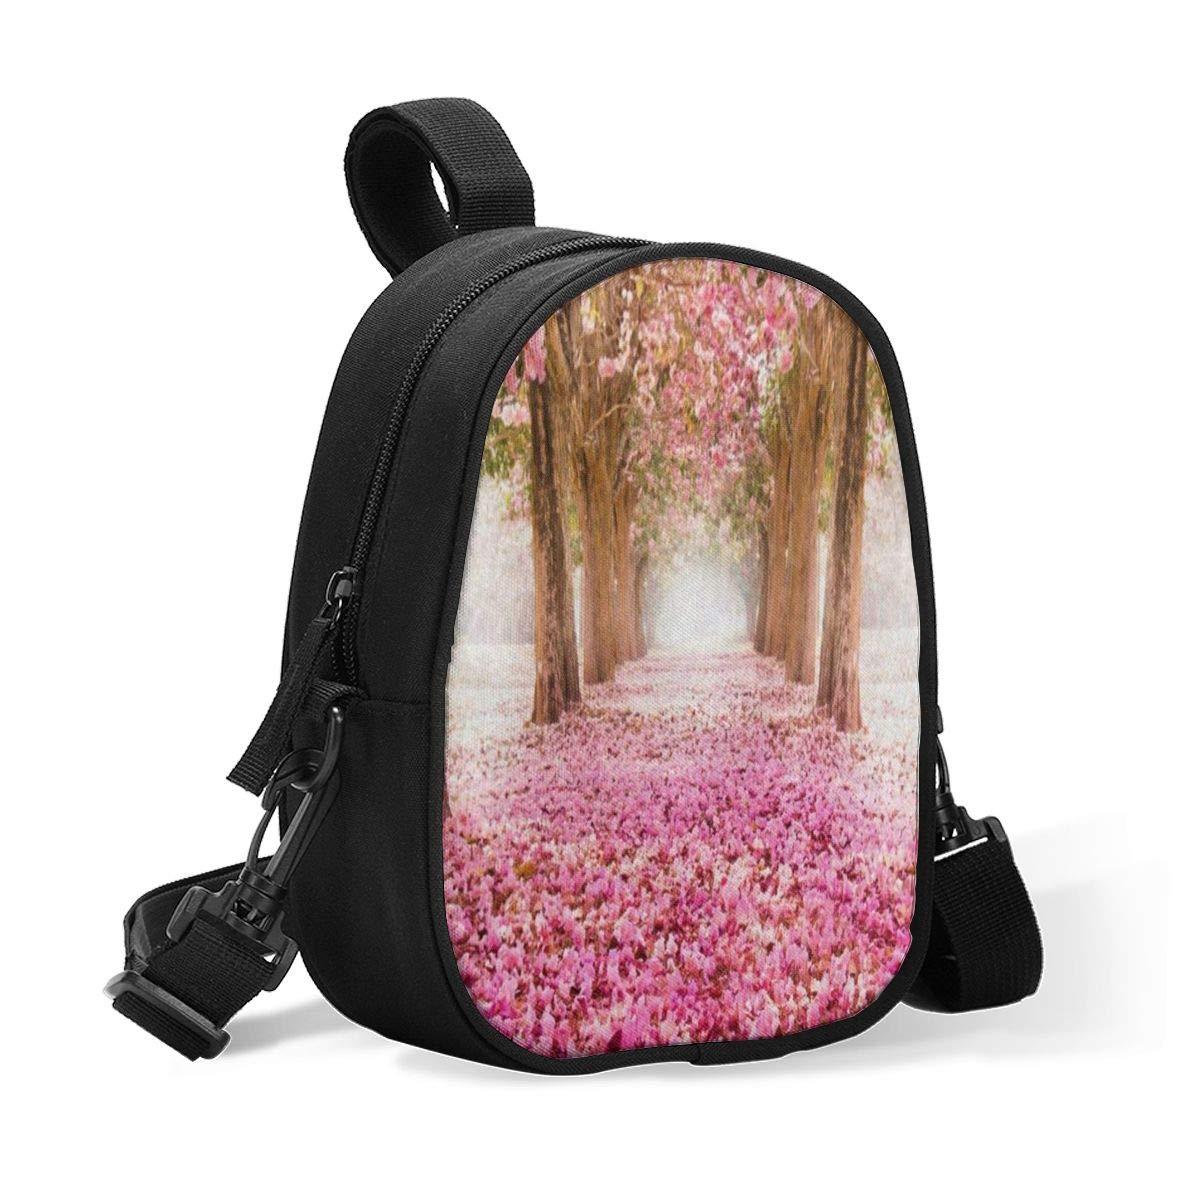 Insulated Baby Bottle Bag Wedding Pink Flower Tree Multi-Function Breastmilk Cooler Bag & Lunch Bag, Fit As Wine Carrier Or for Milk Bottles, for Nursing Mom Back to Work for 2 Large Bottles